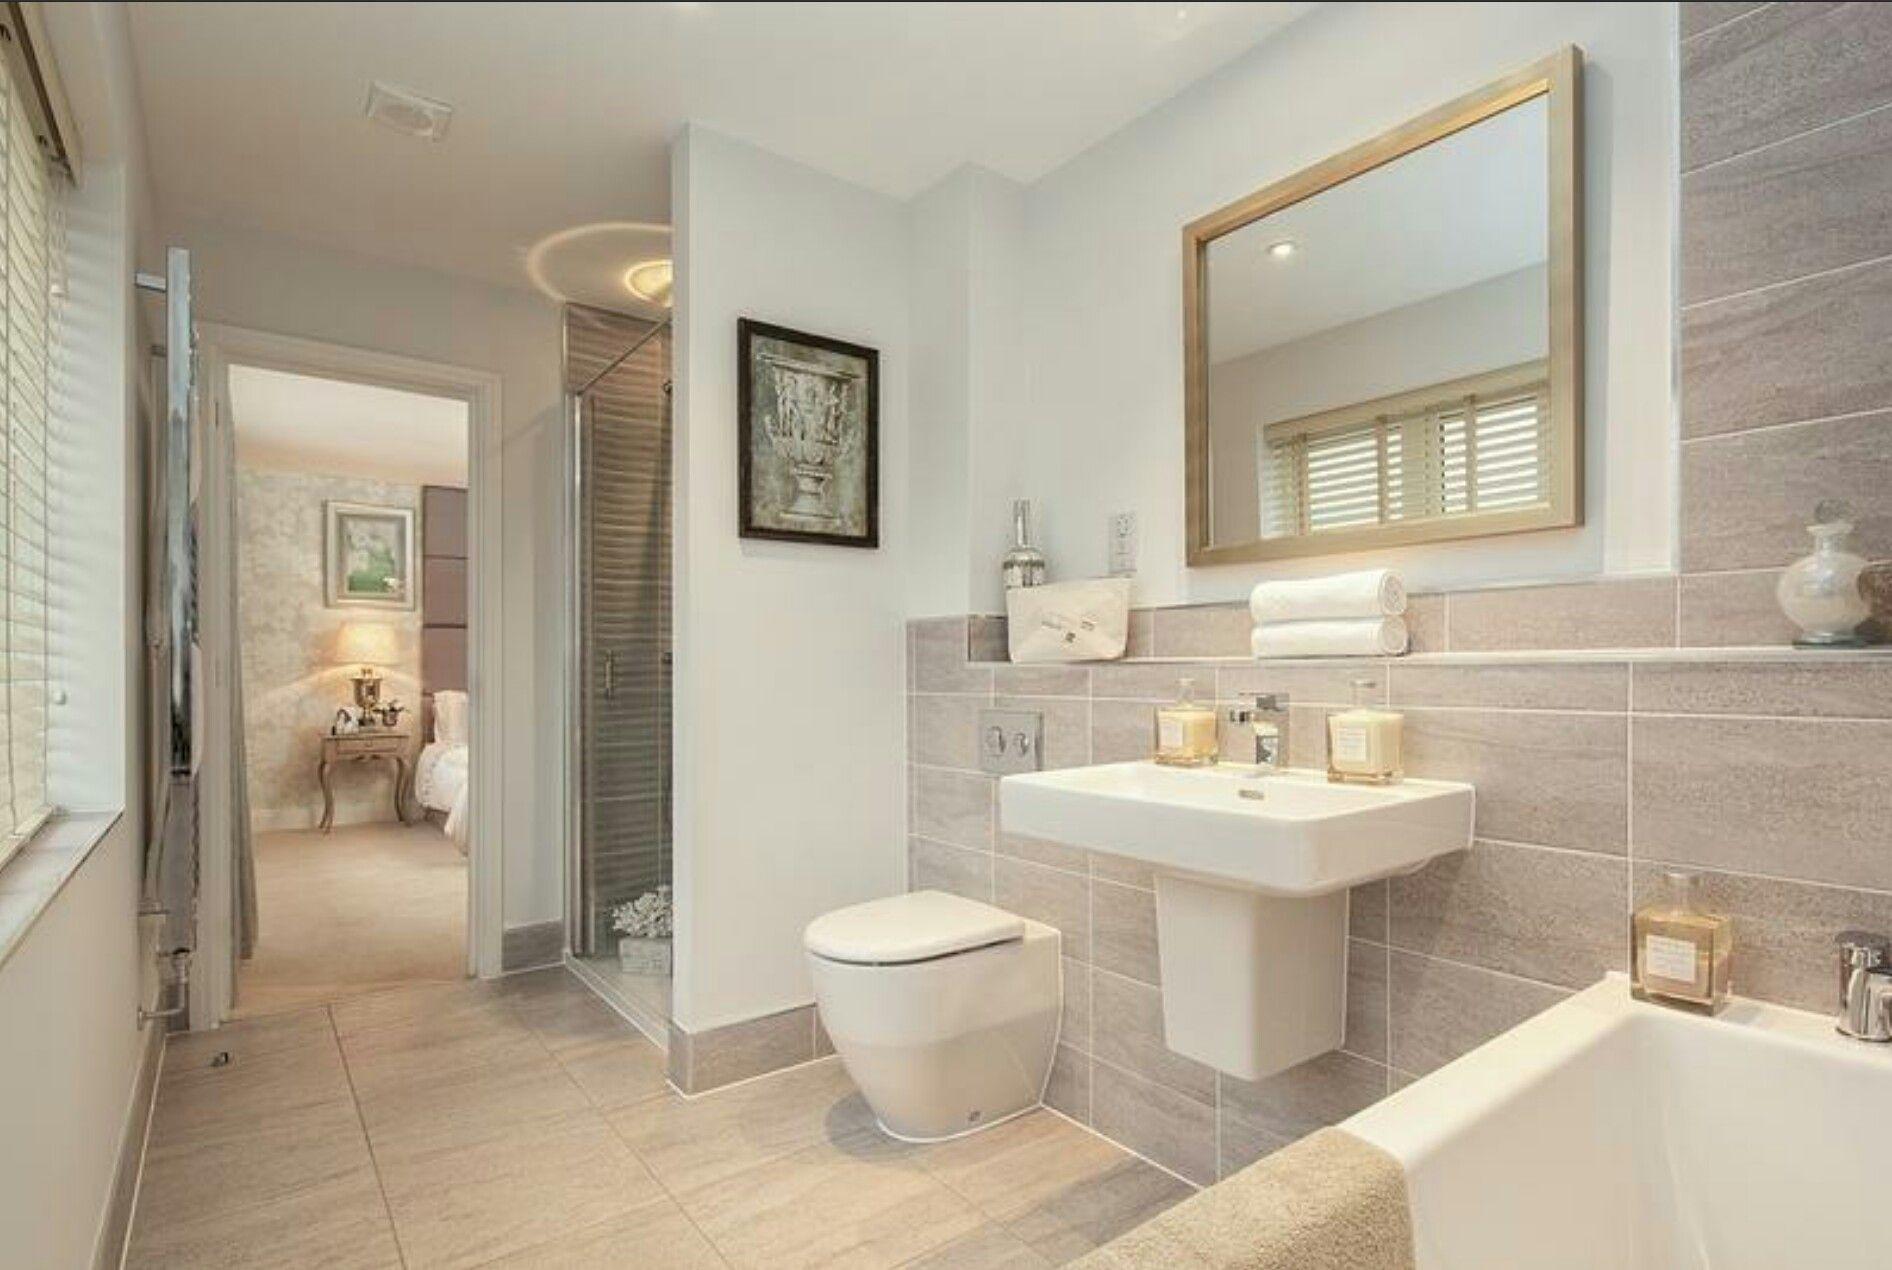 Best Interior Designed Master Bedroom And Ensuite Bathroom 400 x 300